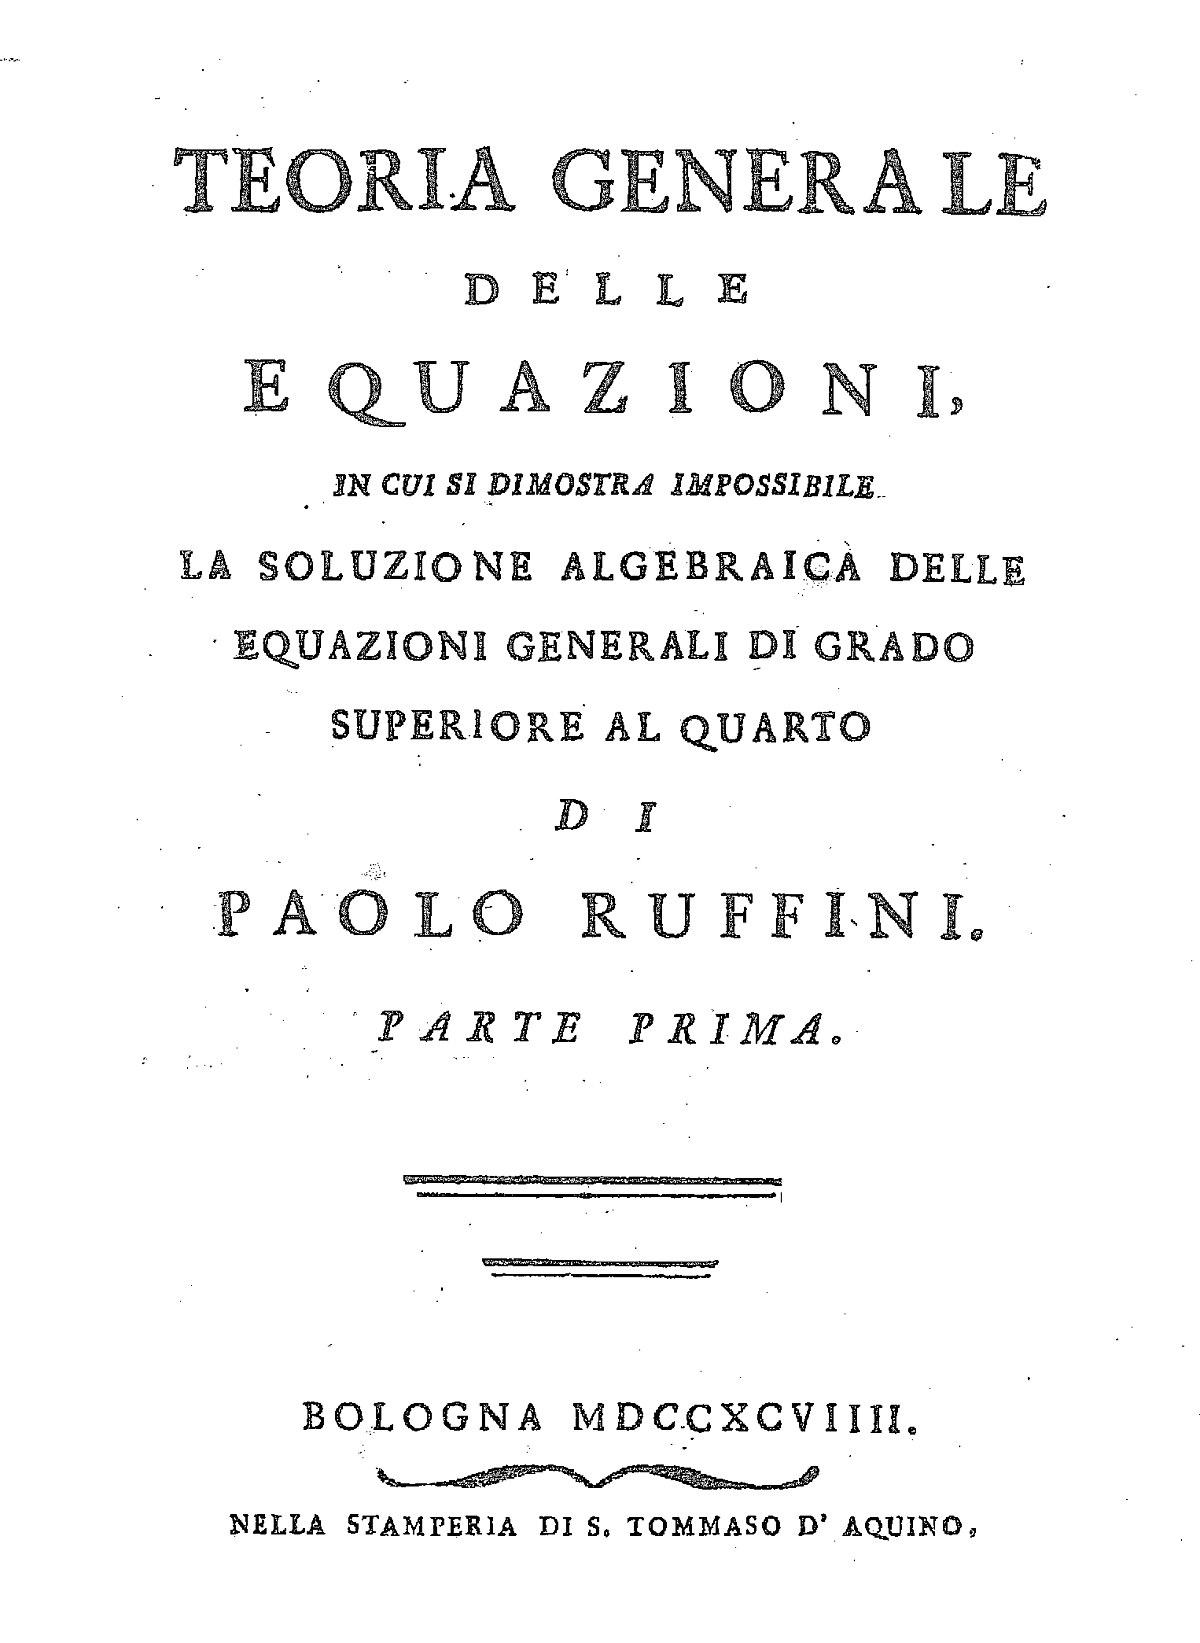 An essay on the history of algebra